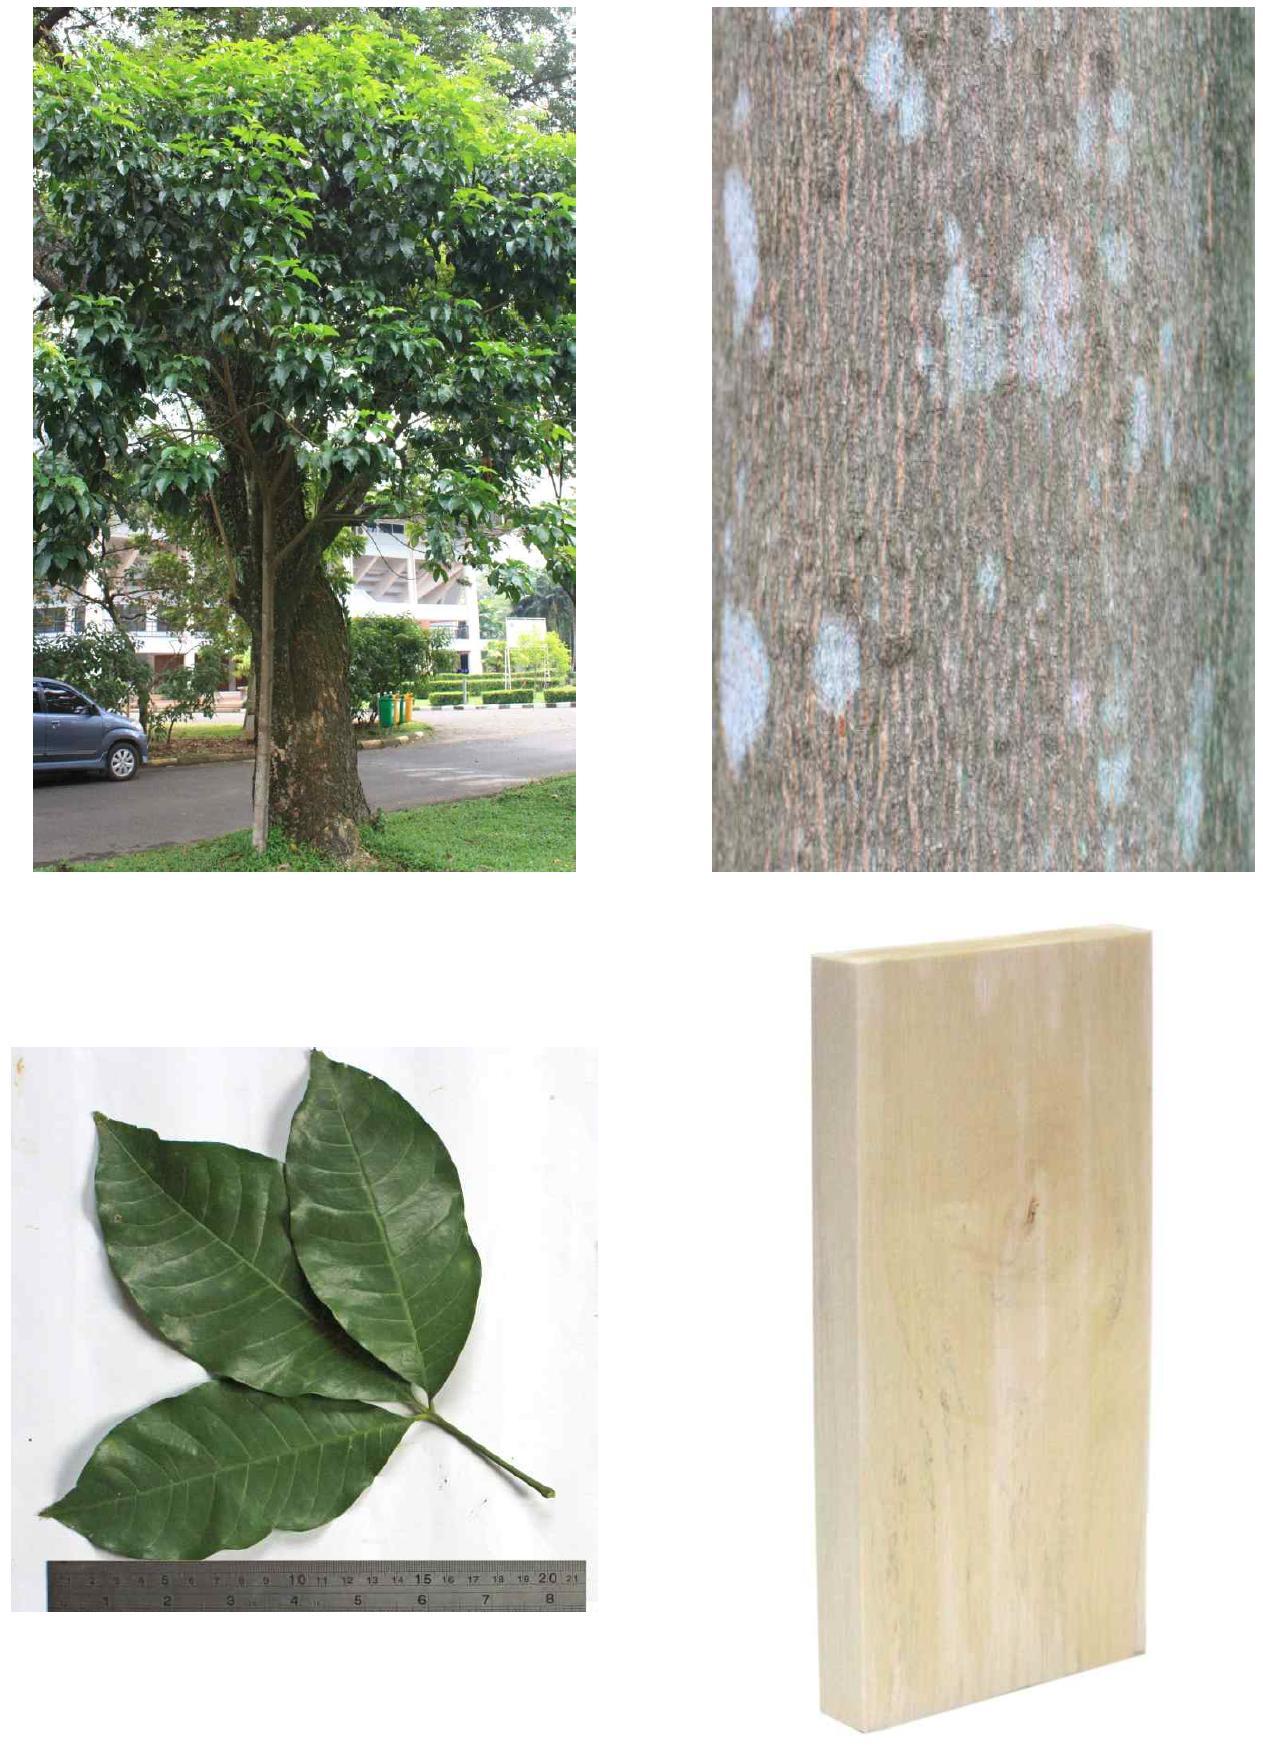 Kisampang의 전체수형, 수피, 잎 및 재면.